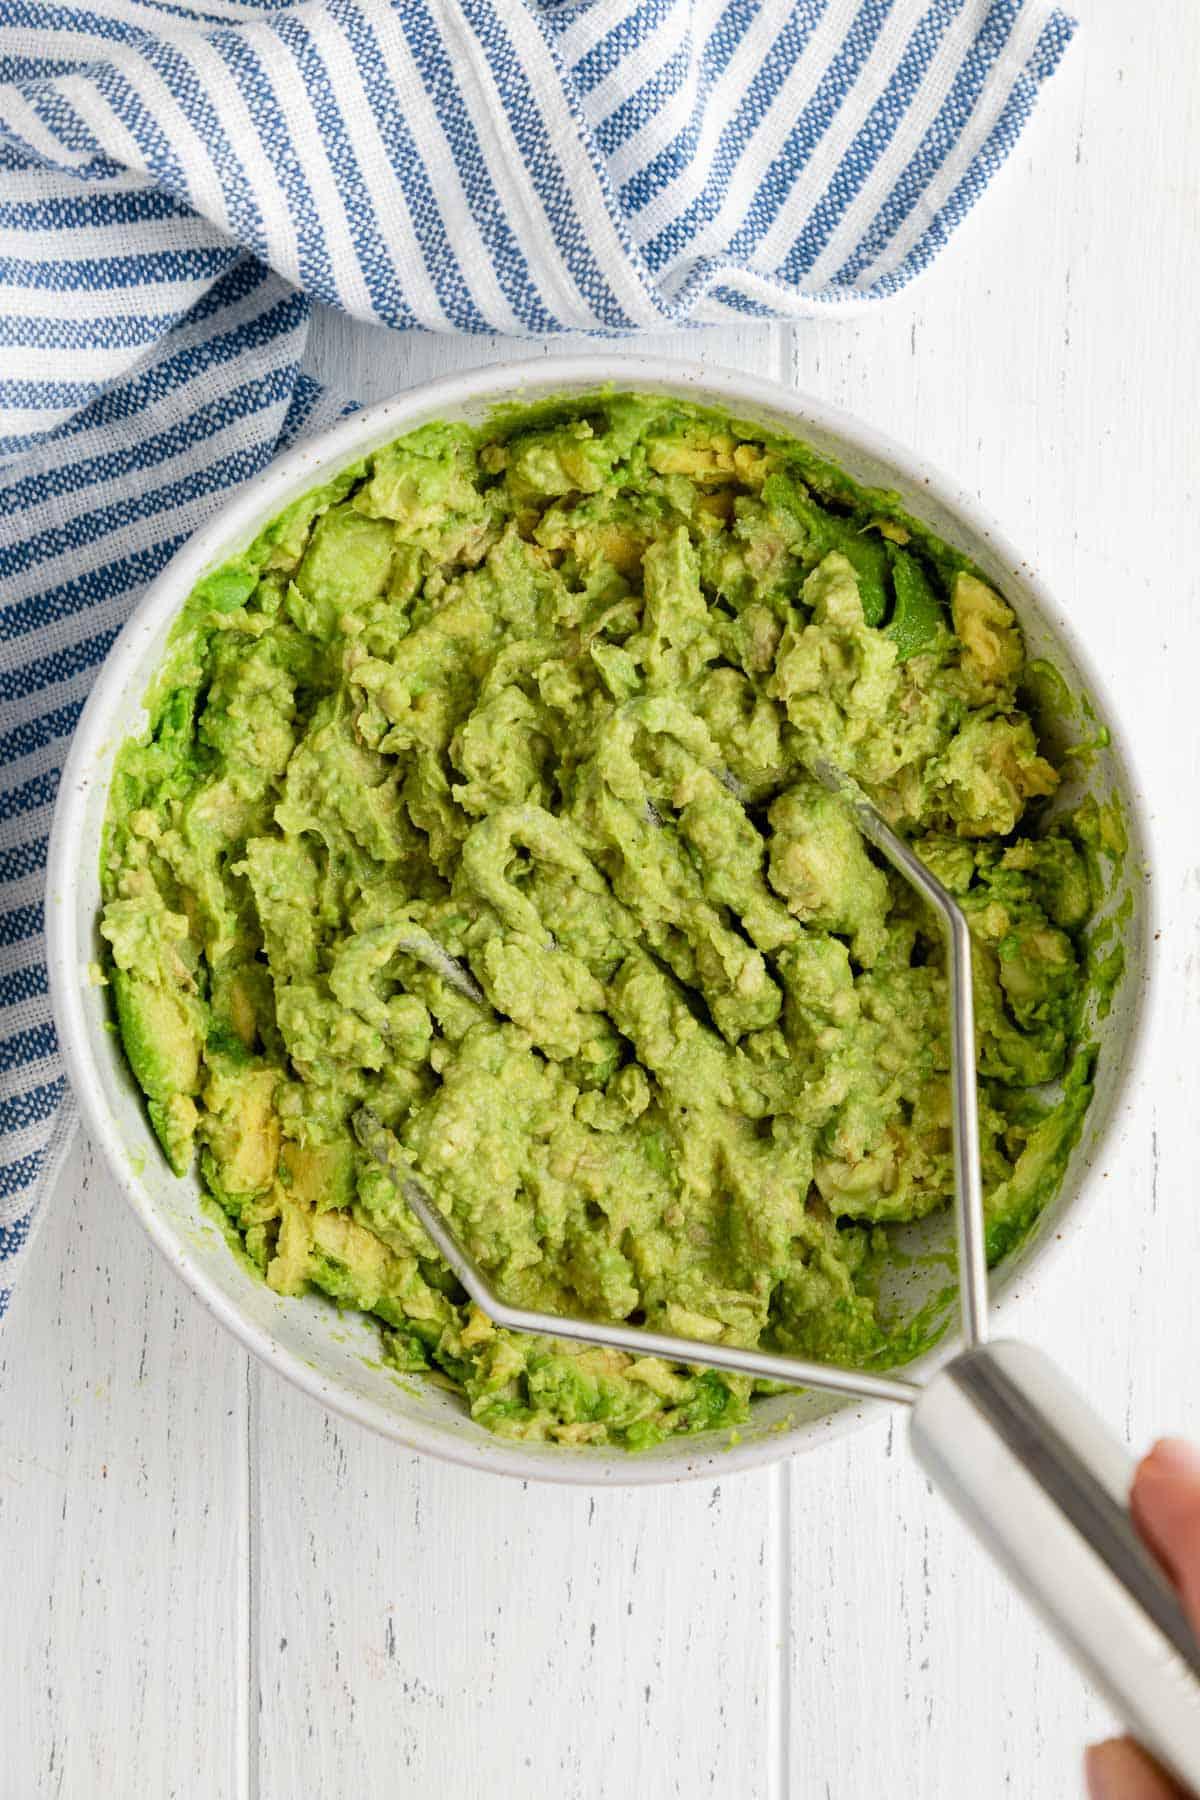 mashing avocado in a bowl